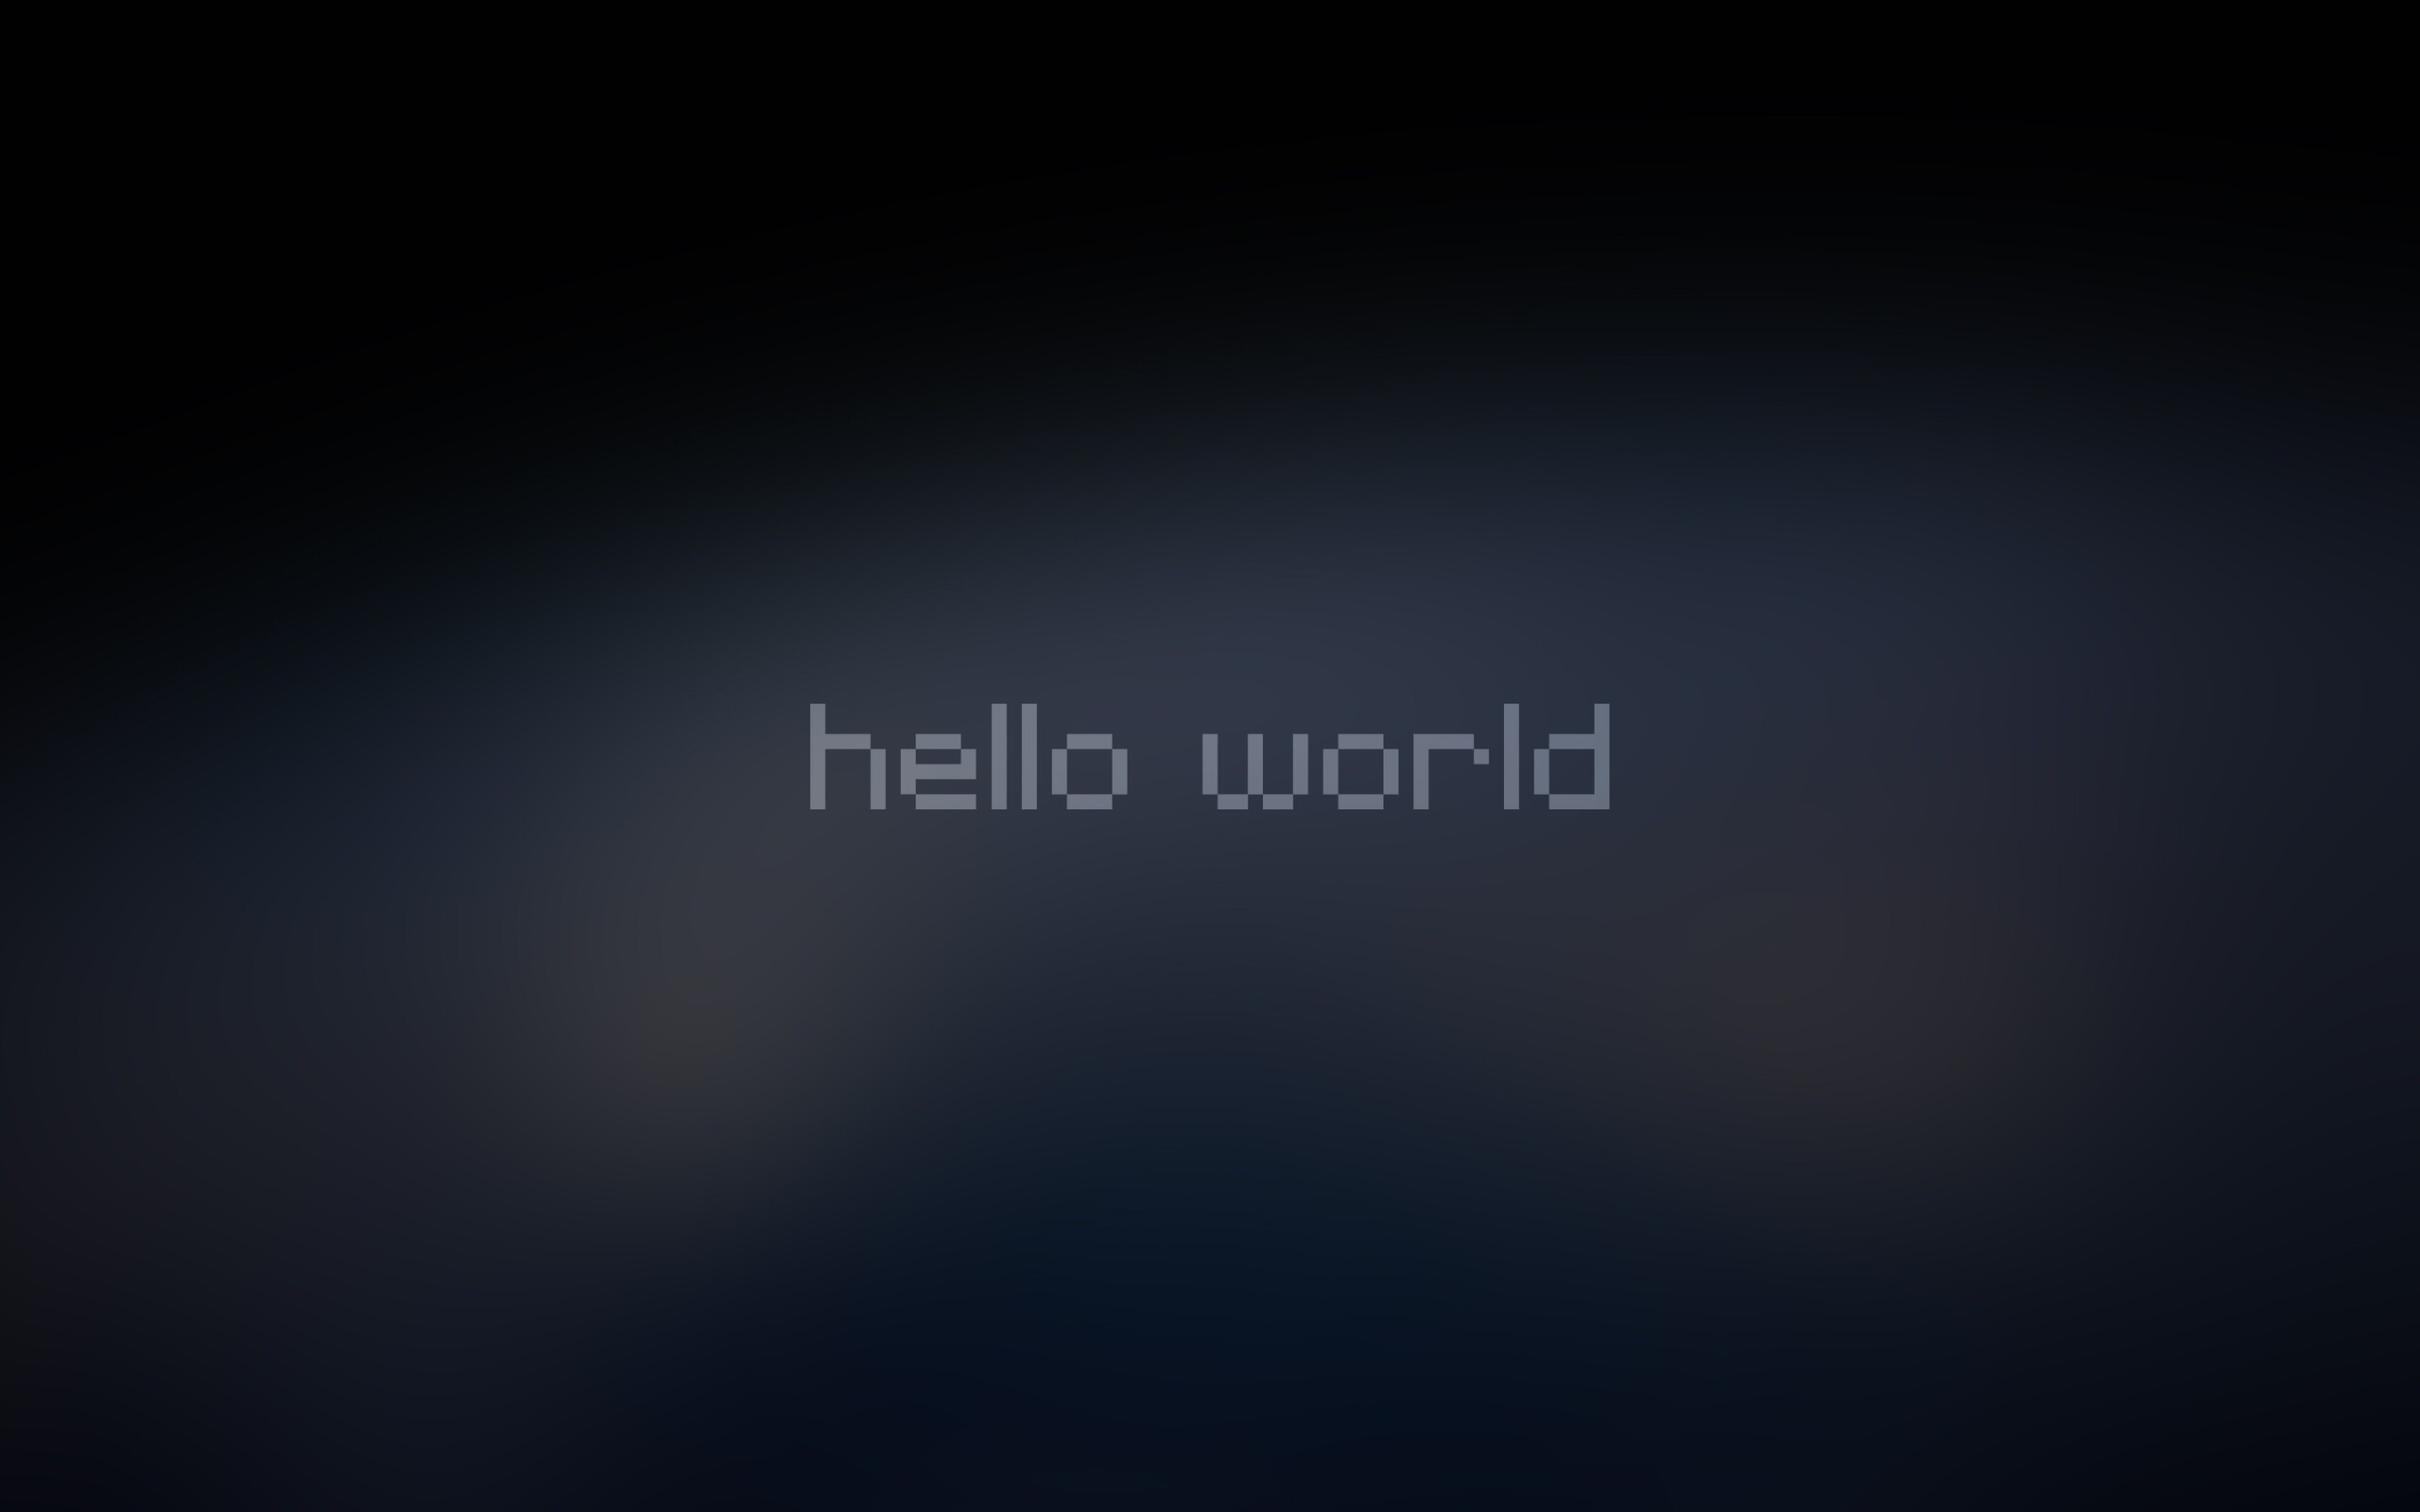 hello-world-4k-0o.jpg